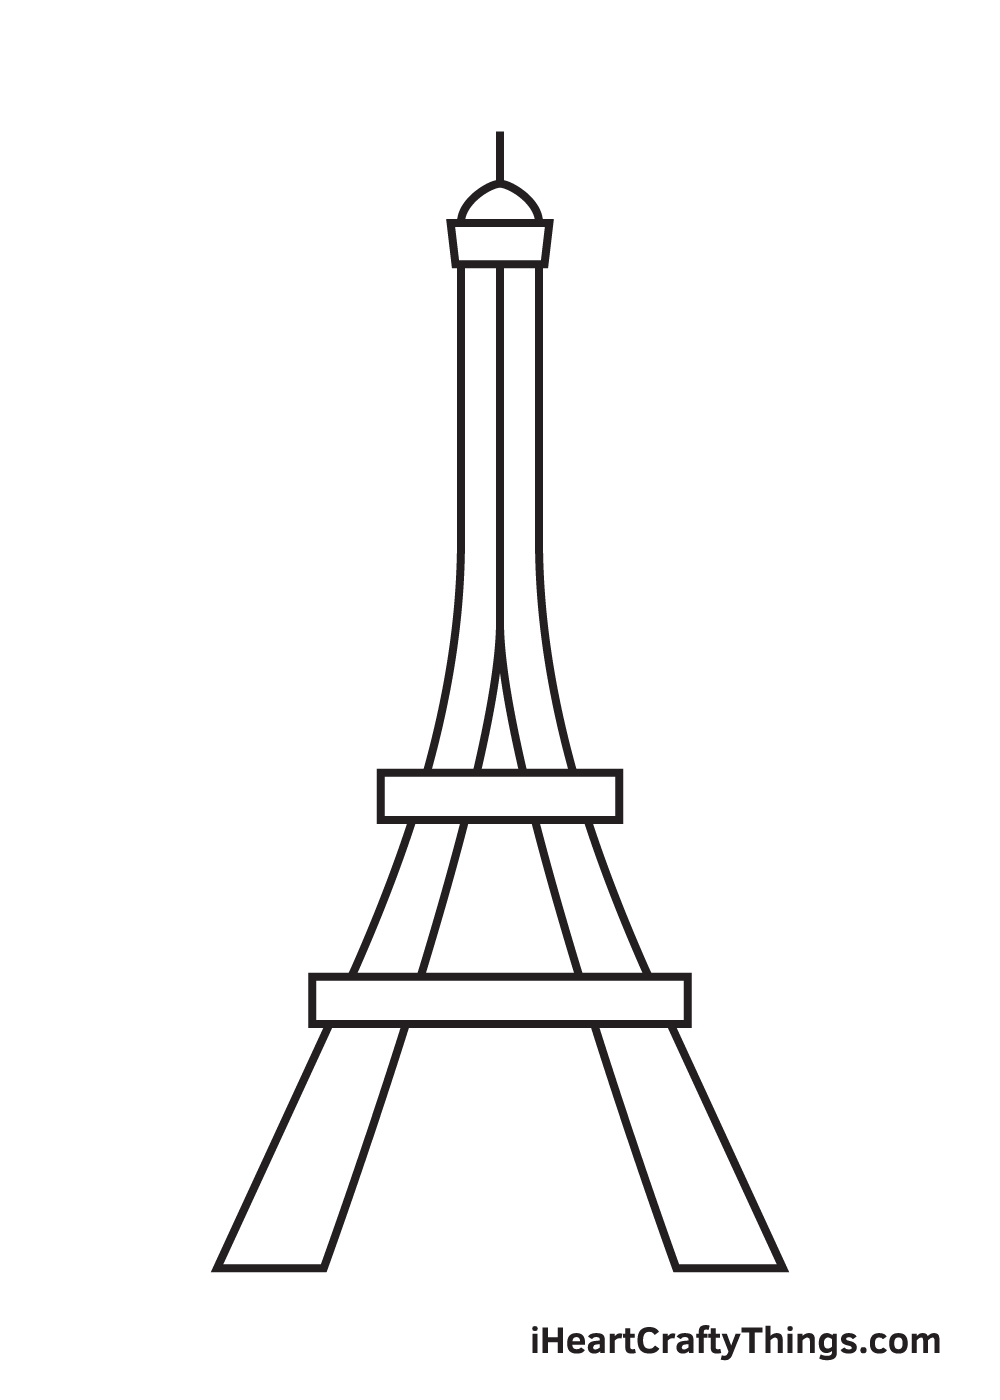 Eiffel Tower drawing - step 5